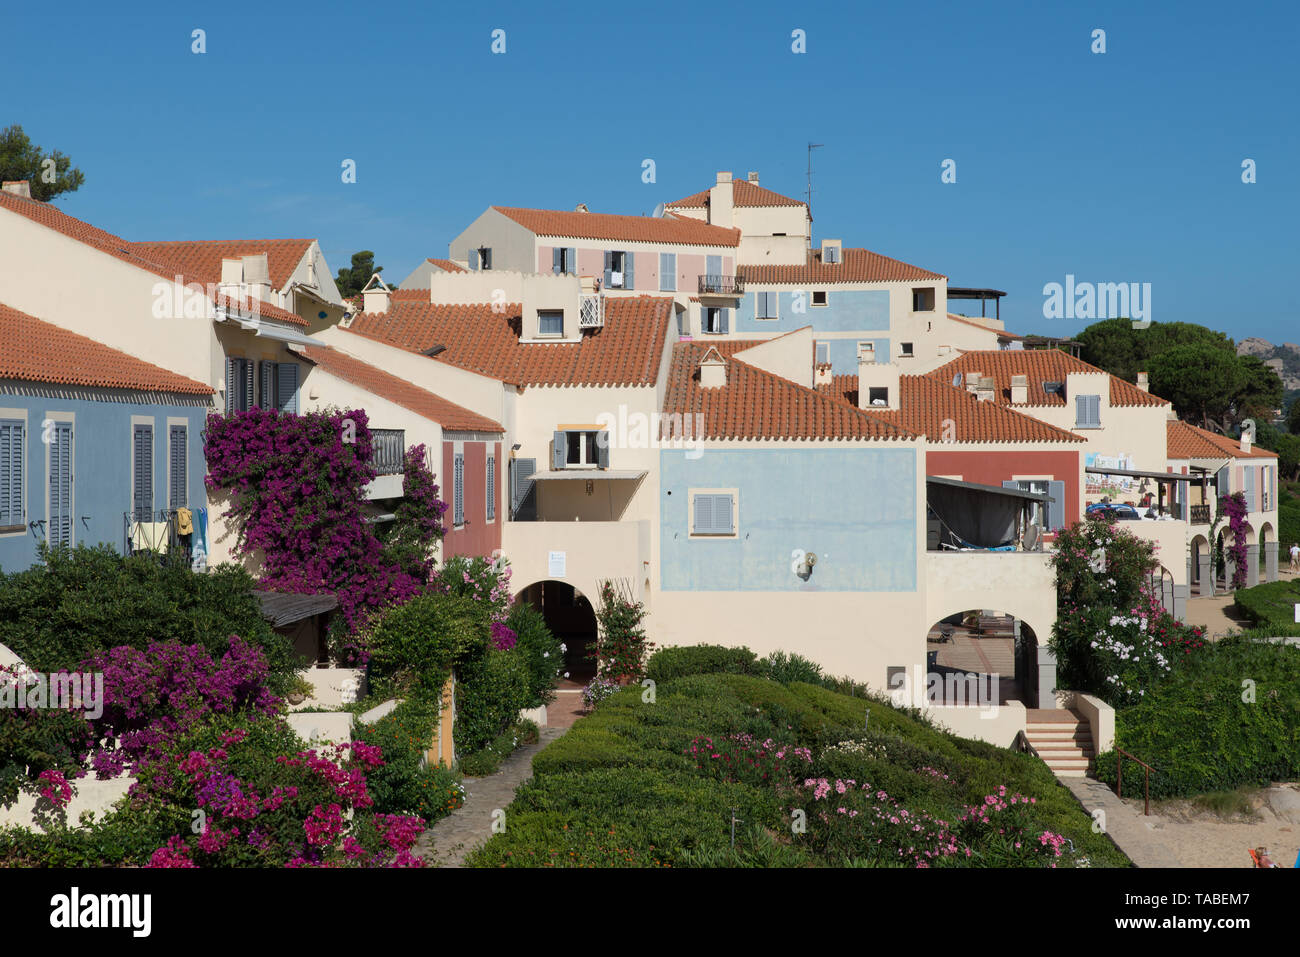 Porto Faro nahe Palau, Sardinien, Italien. / Porto Faro near Palau, Sardinia, Italy. - Stock Image